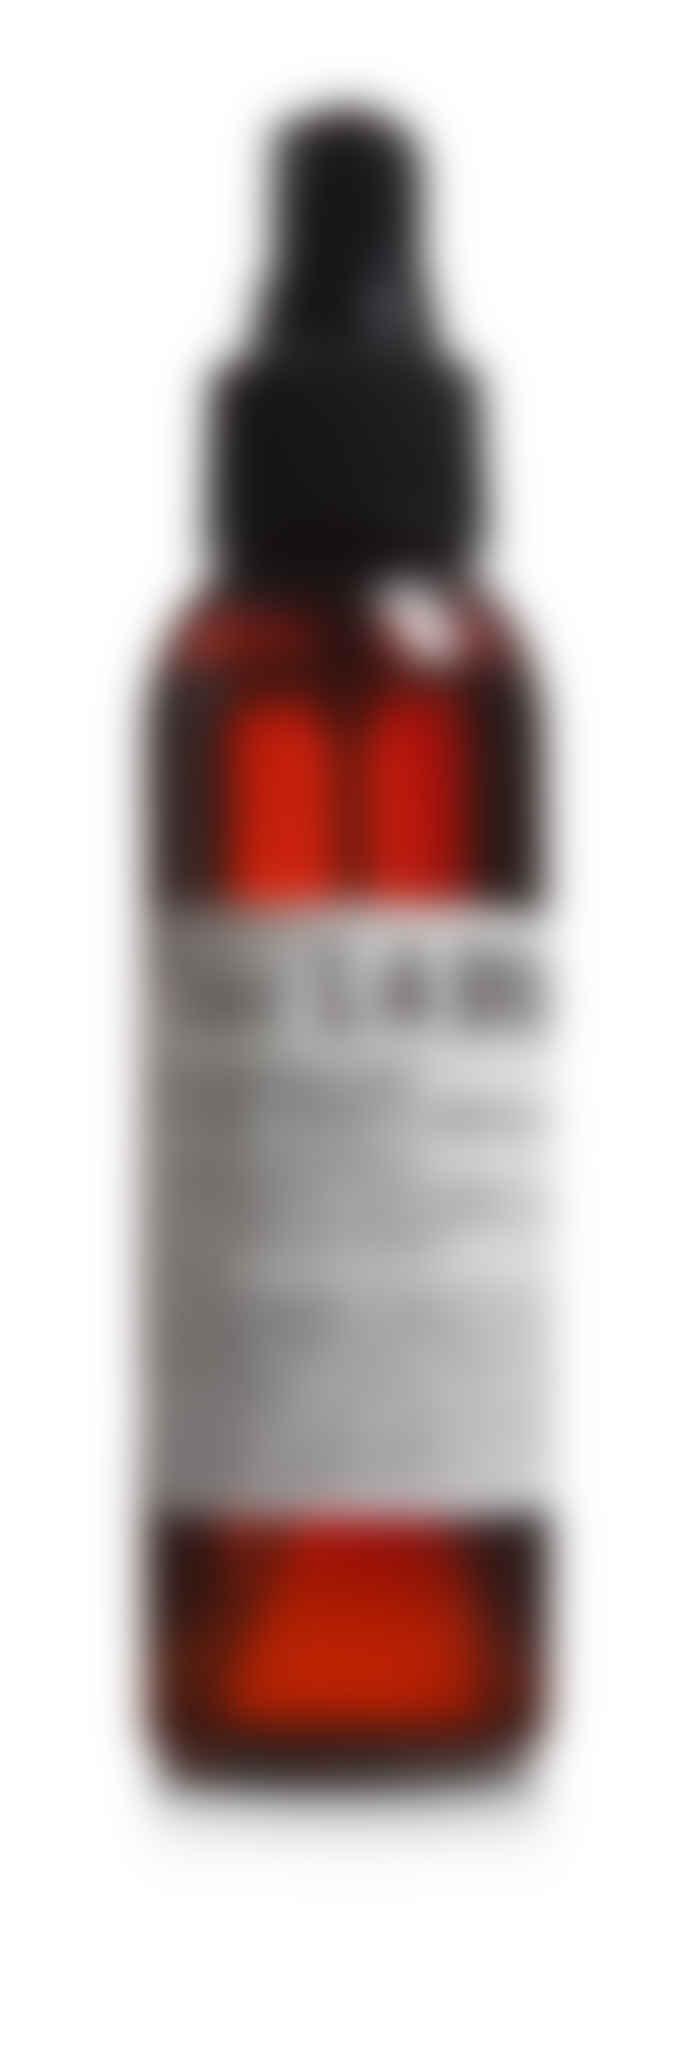 L:A Bruket 120ml No 099 Chamomile and Bergamot Facial Toner and Refresher